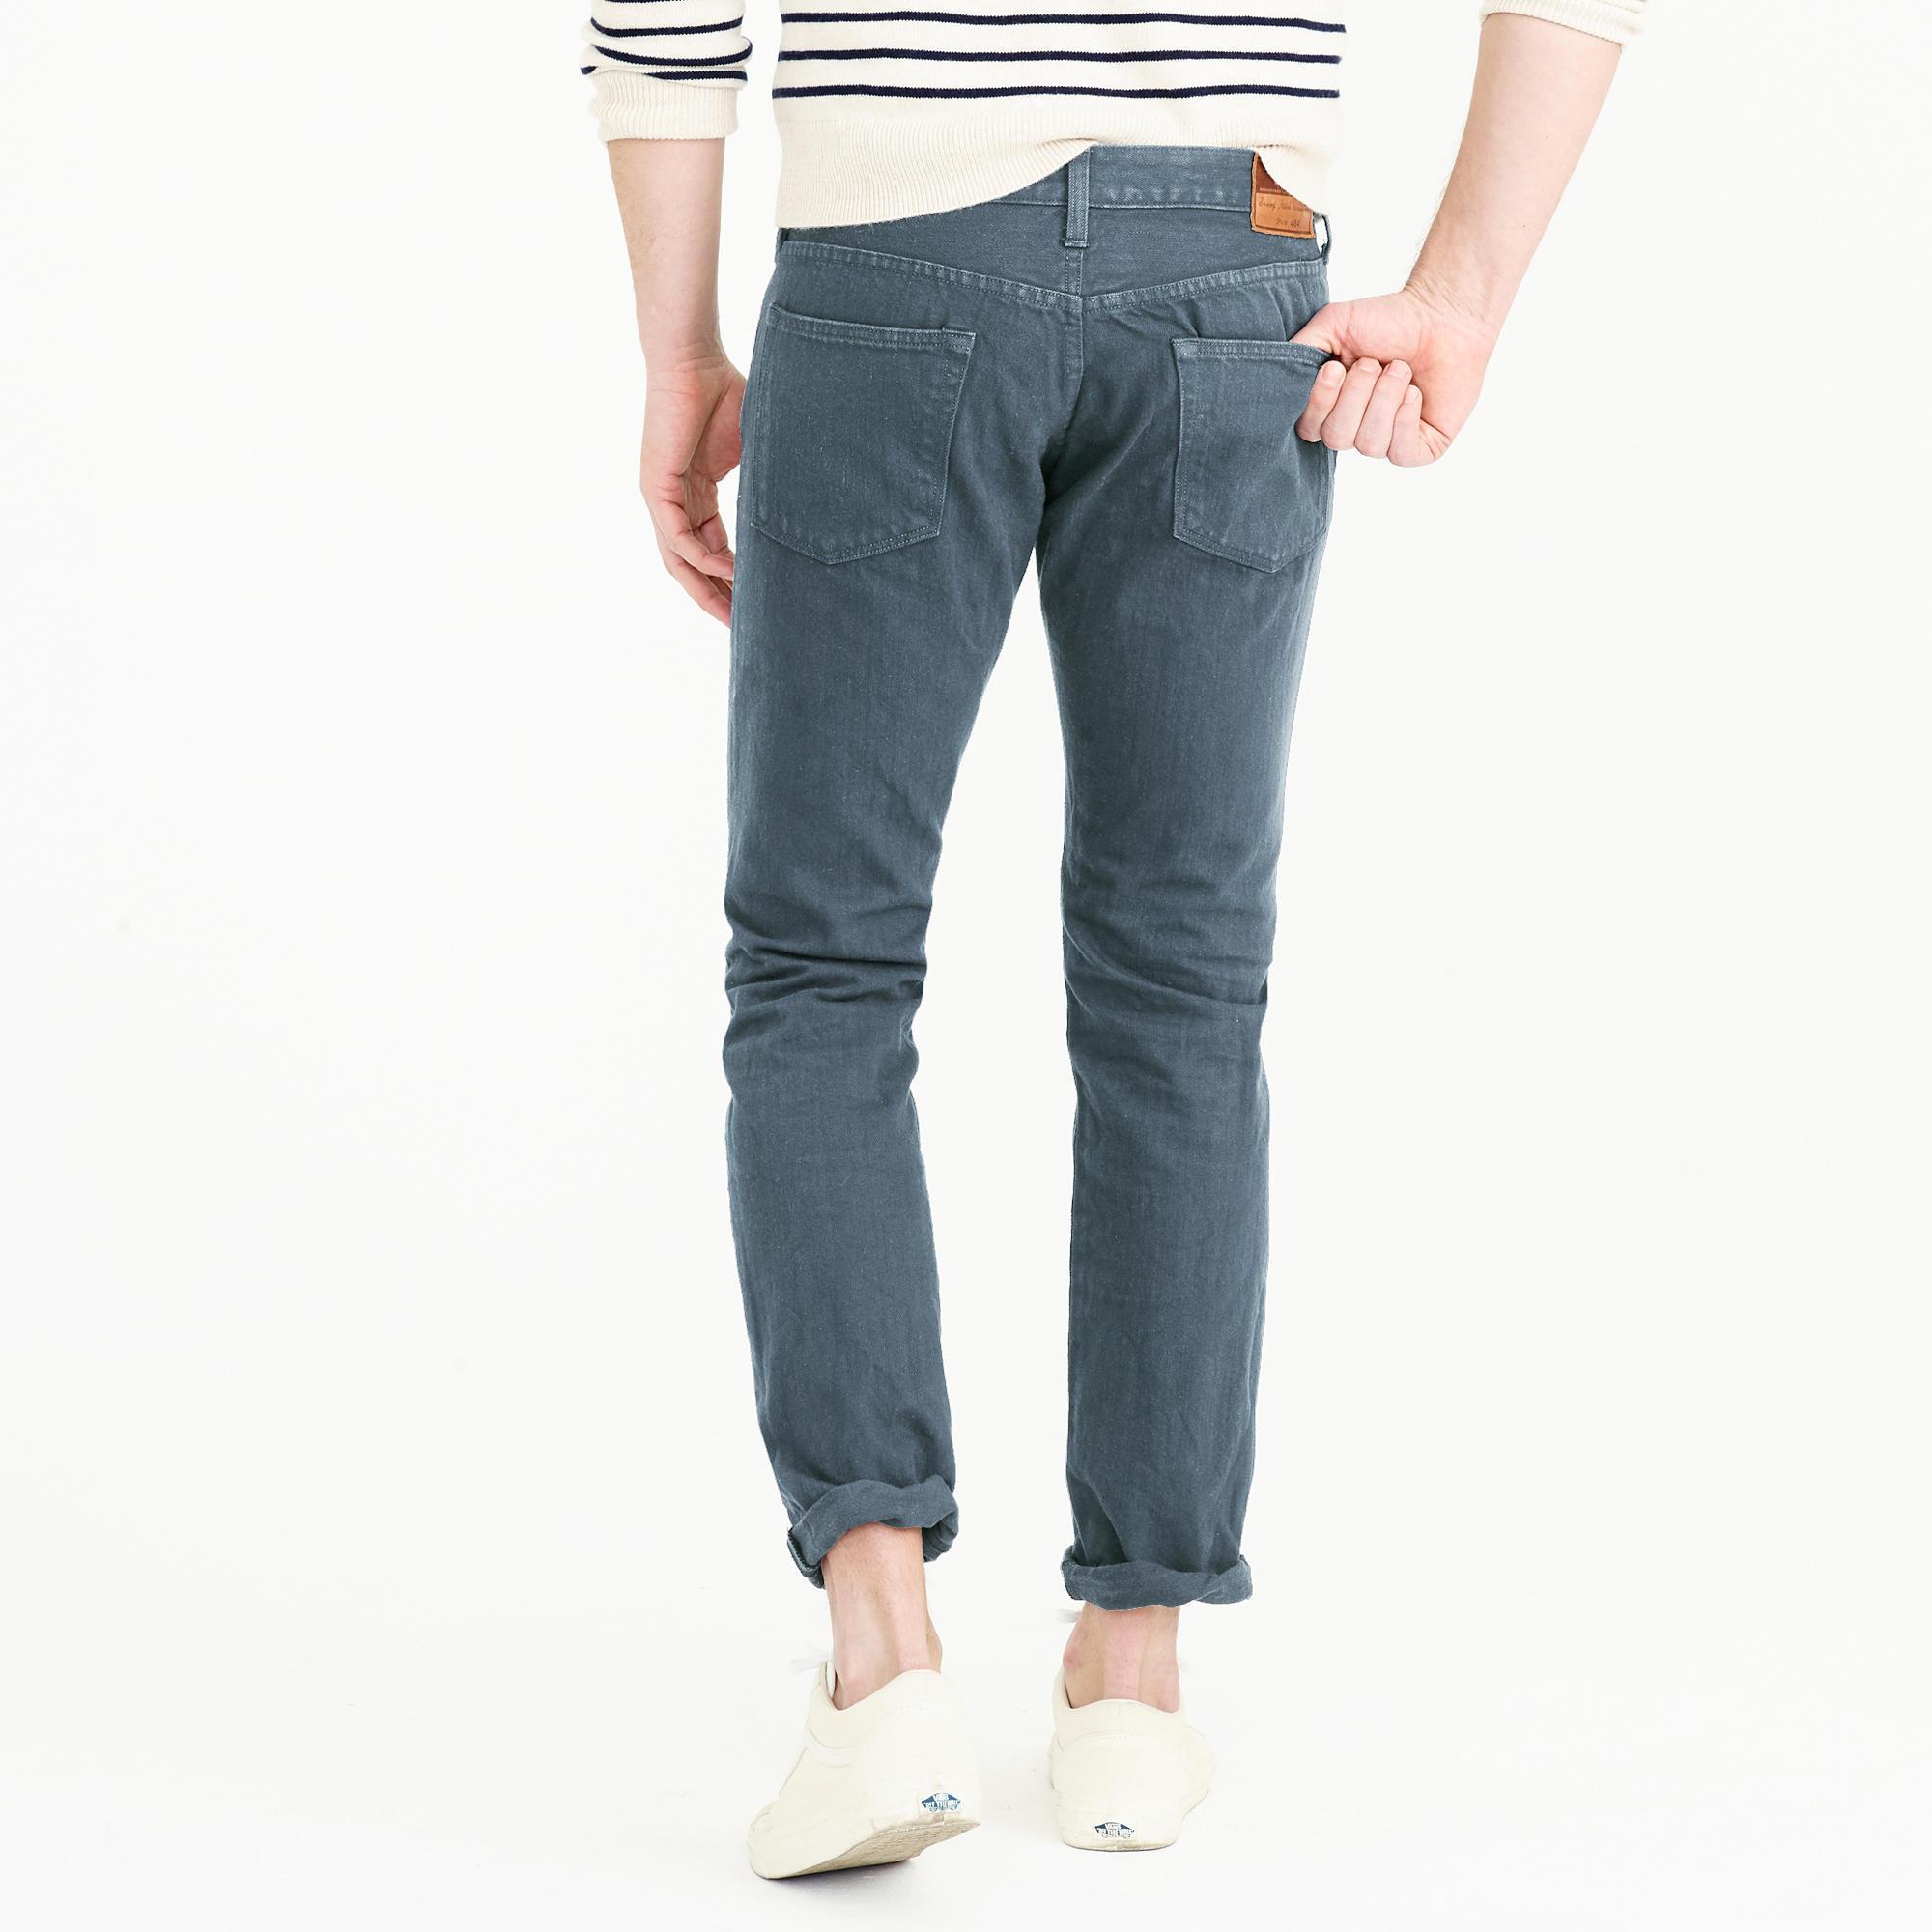 J.Crew 484 Jean In Garment-dyed American Denim in Blue for Men